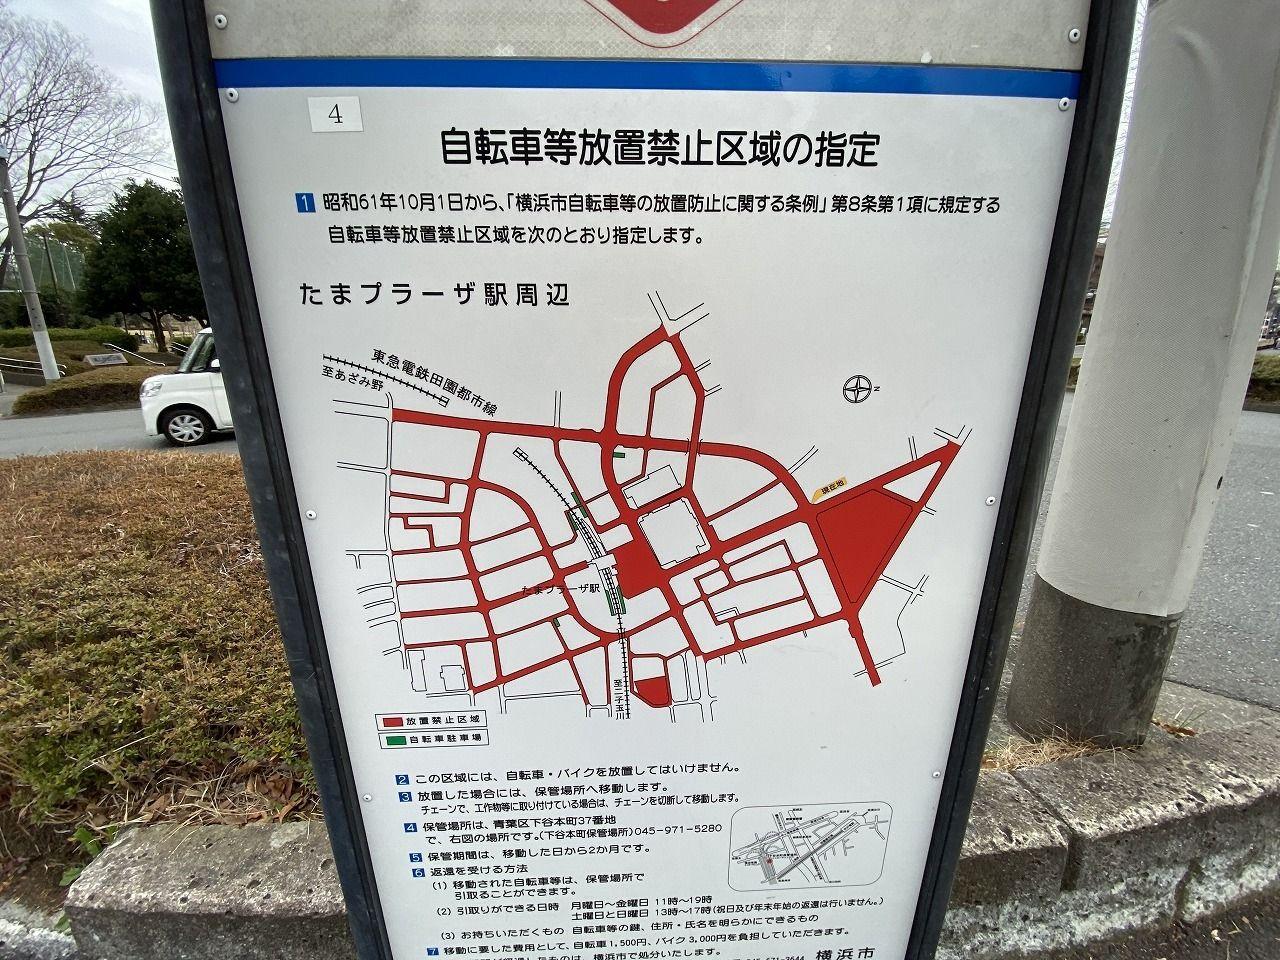 自転車放置禁止区域の指定